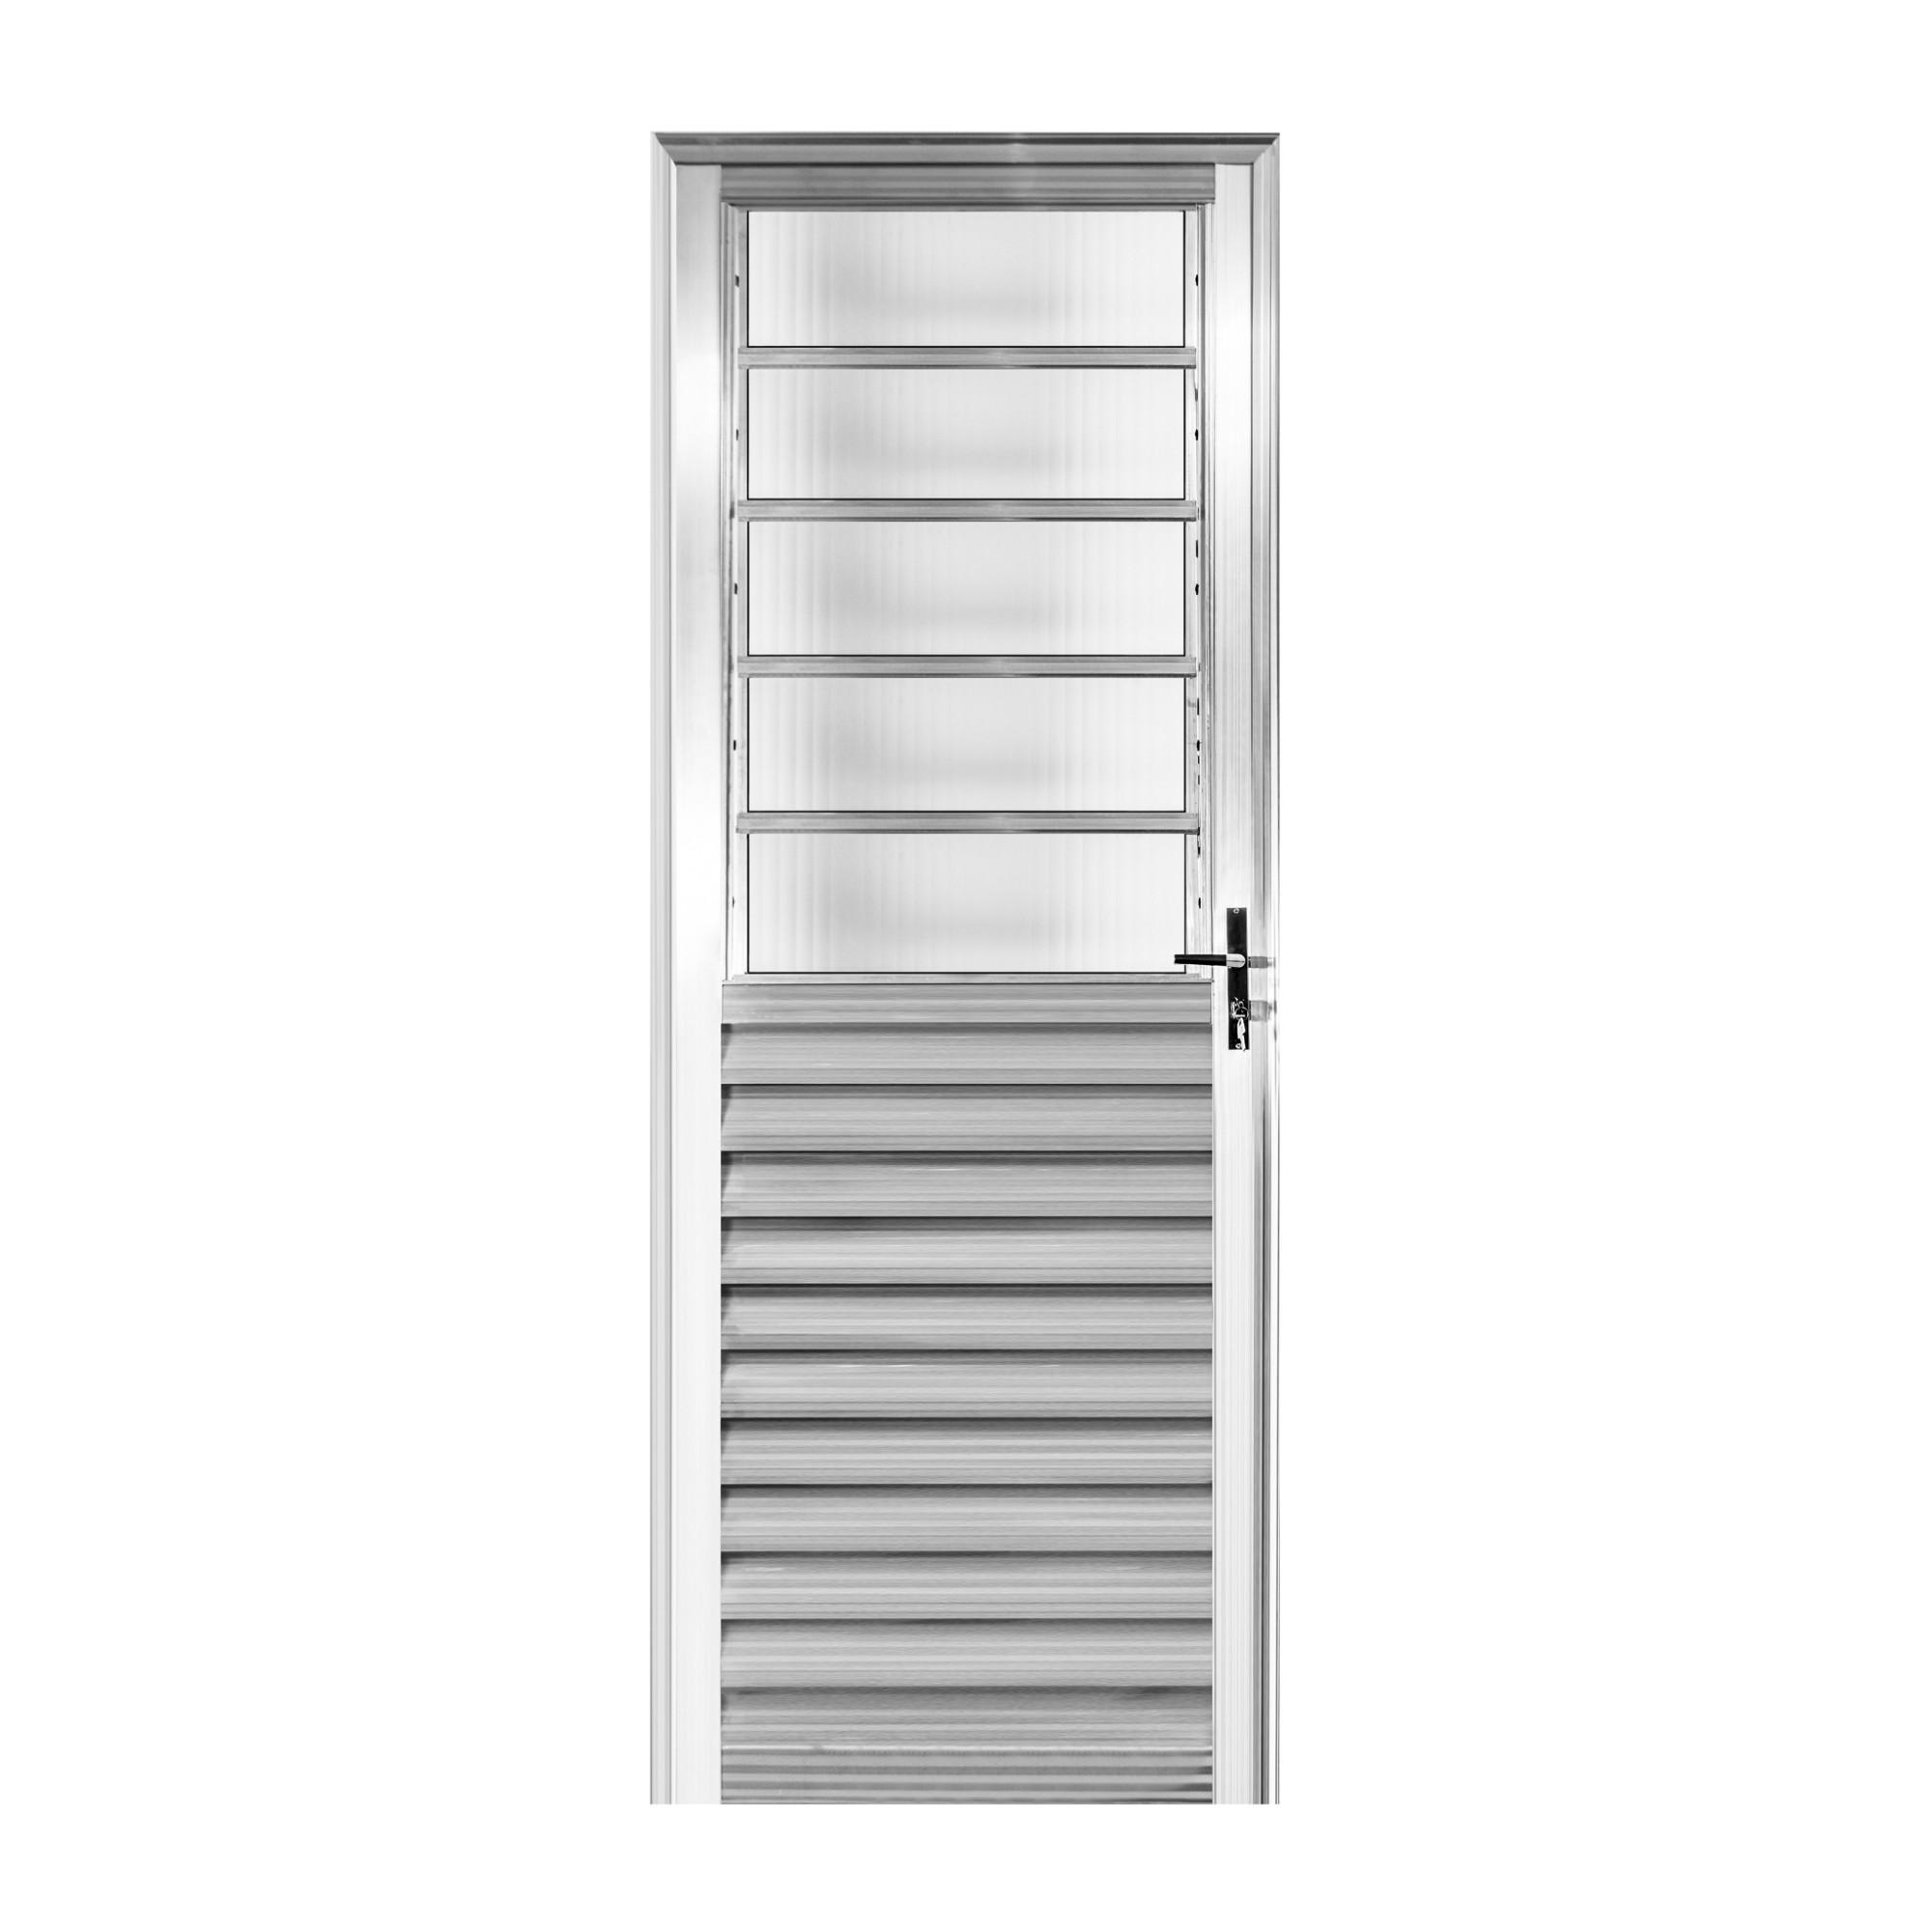 Porta Super Pop de Abrir de Aluminio Basculante 210cm x 80cm Lado Esquerdo - Aluvid